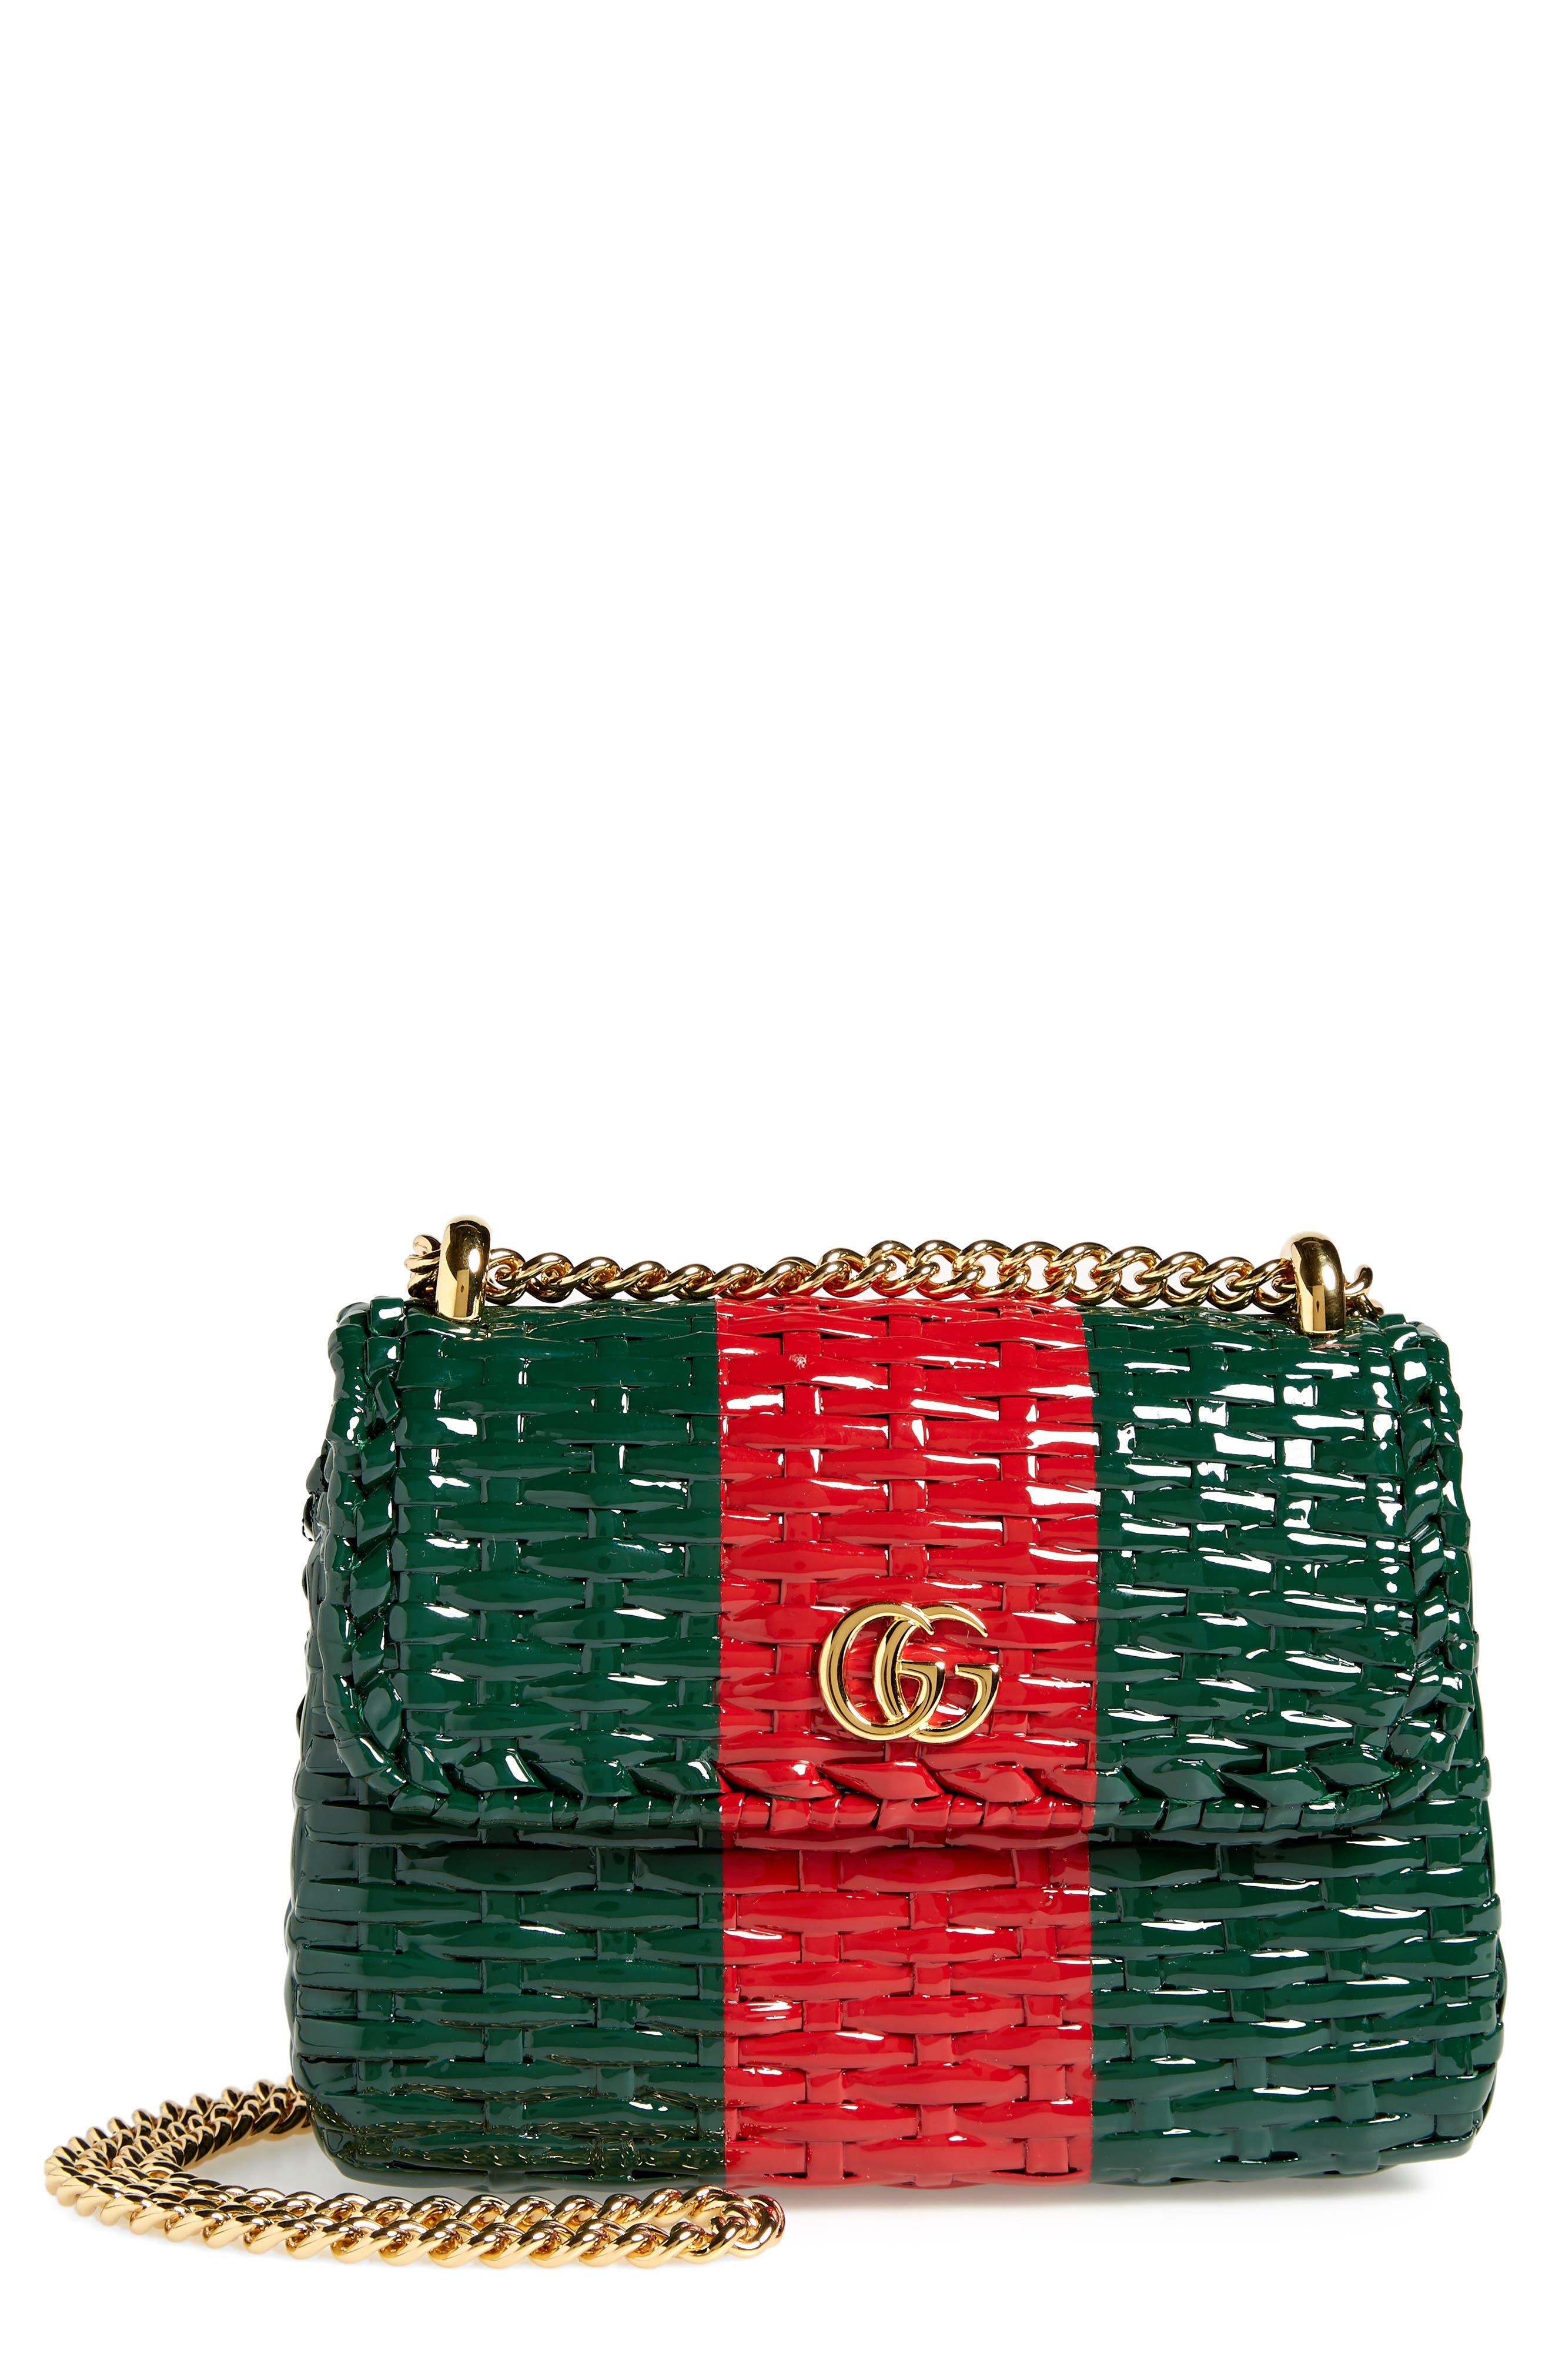 Small Linea Cestino Glazed Wicker Shoulder Bag,                             Main thumbnail 1, color,                             VERDE ROSSO VERDE